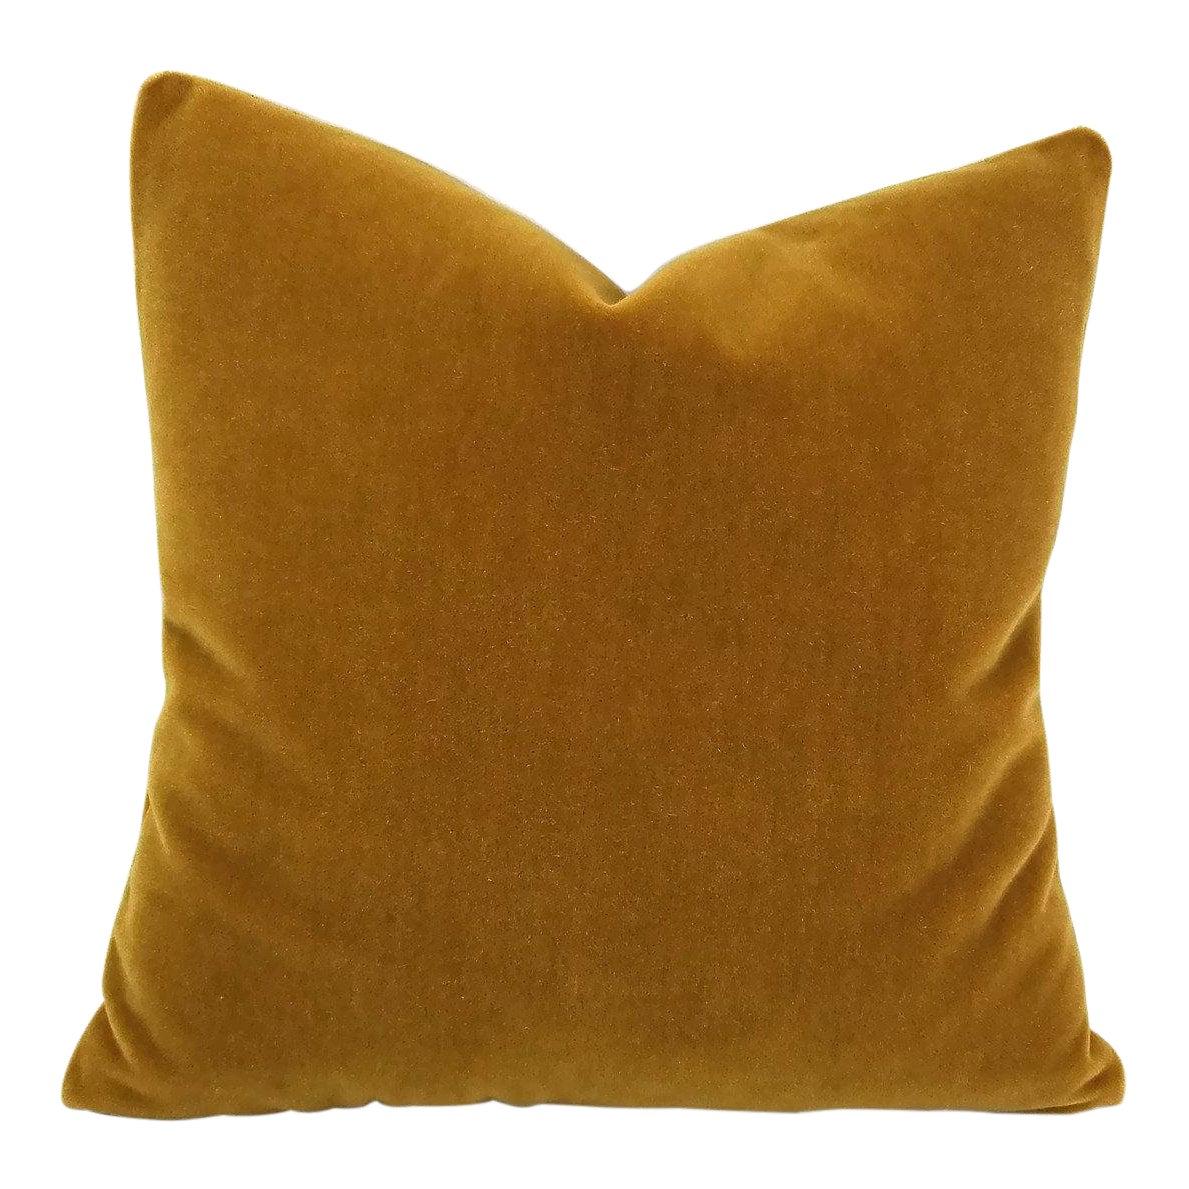 S Harris Ankara Mohair Amber Velvet Pillow Cover 20 X 20 Chairish